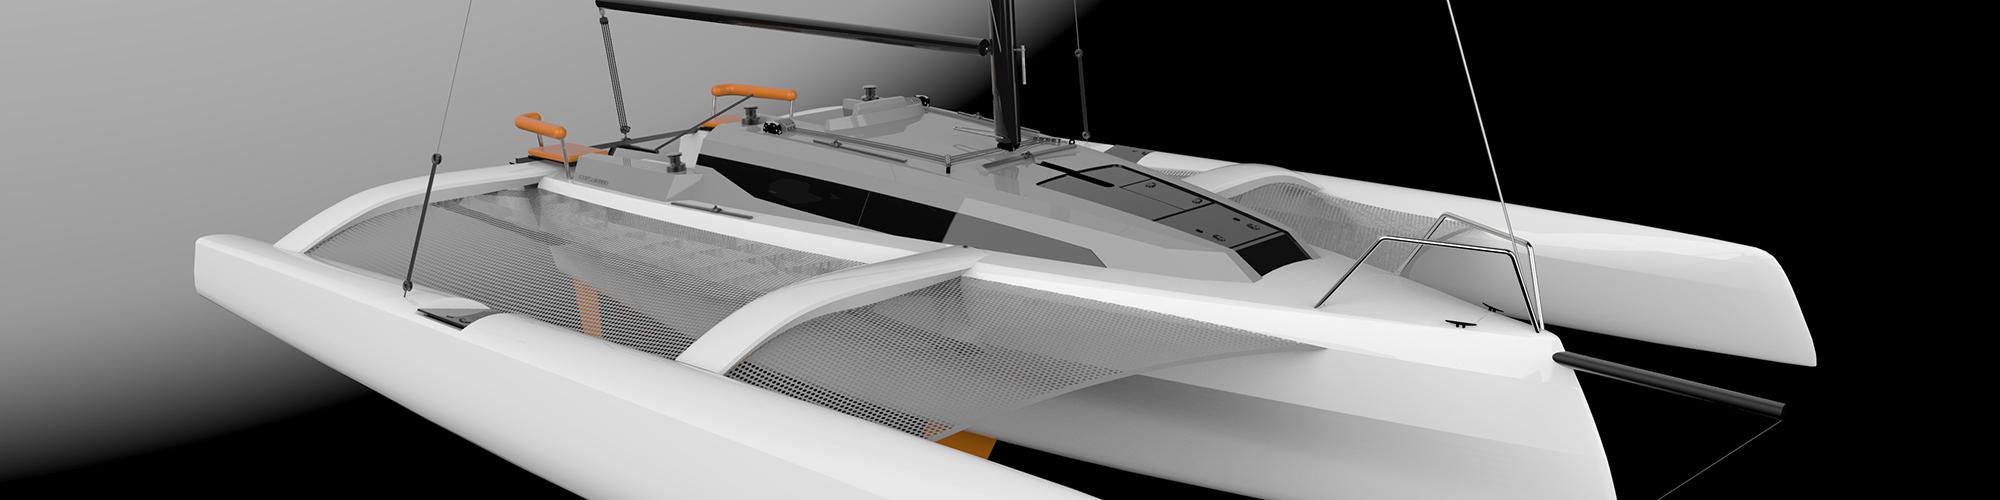 corsair-880-render-2000x500px